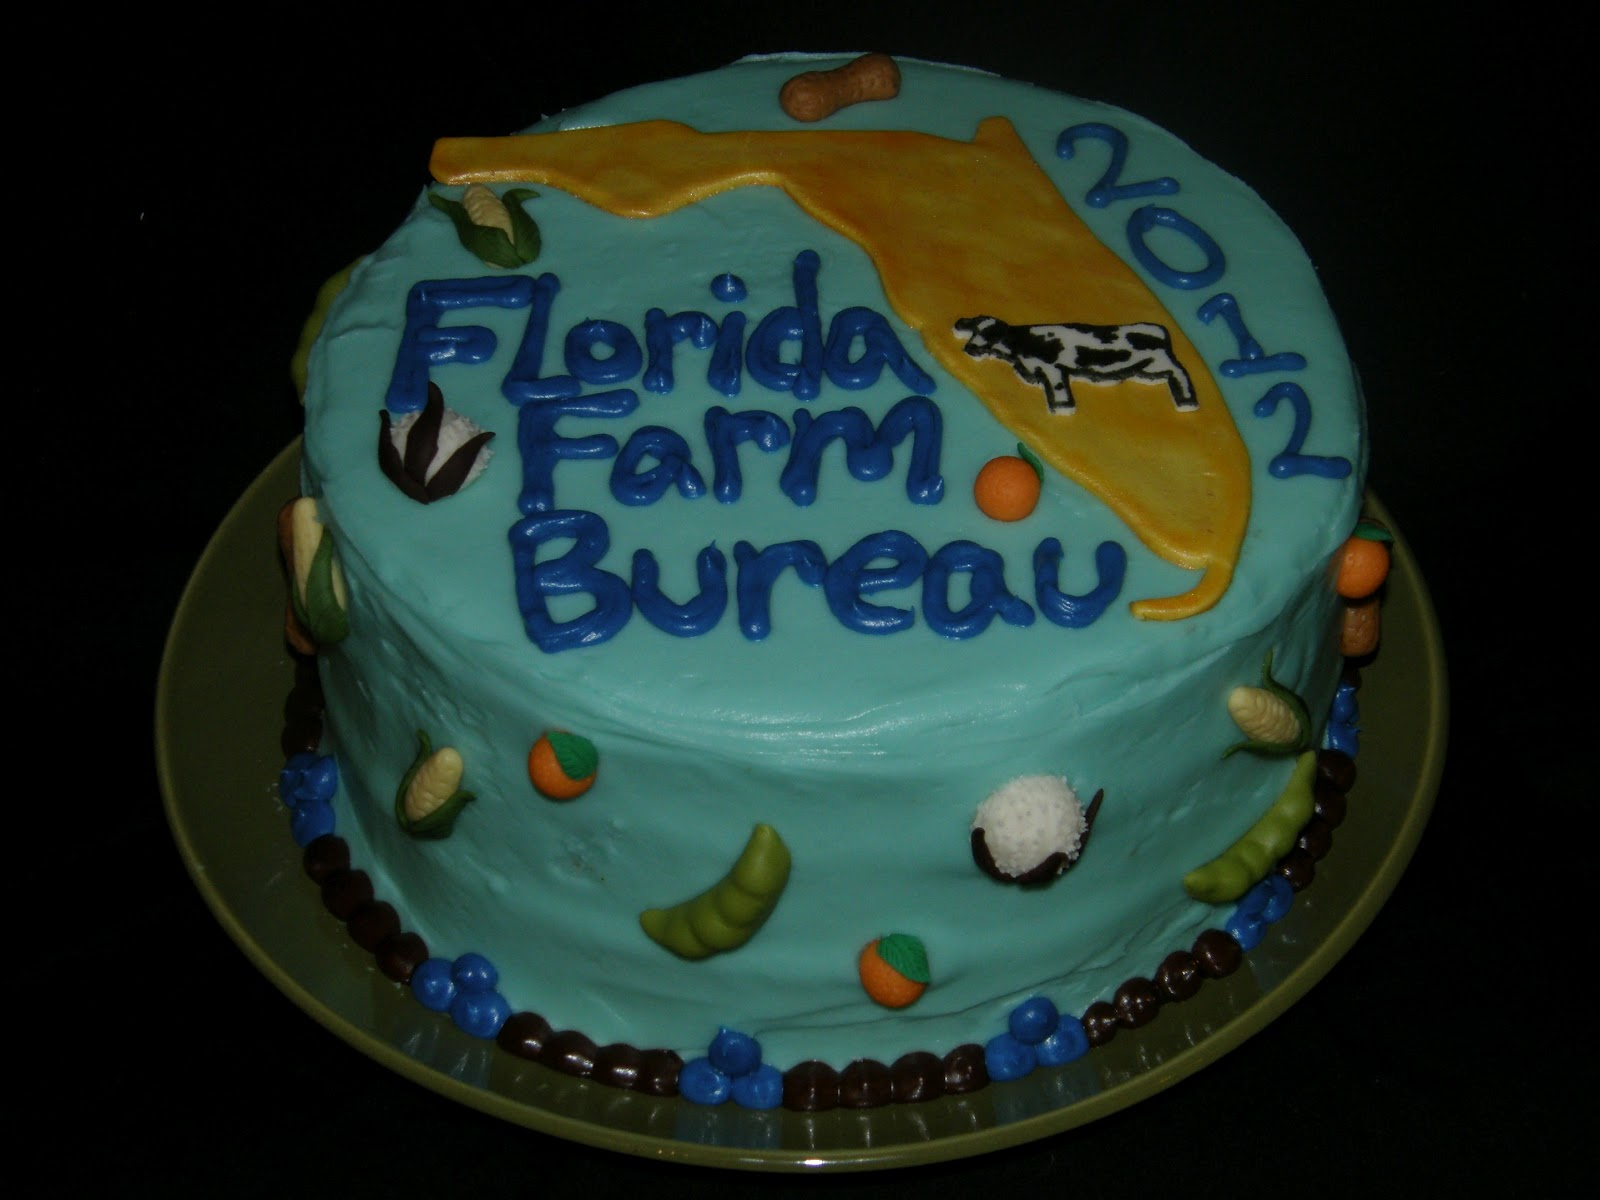 Mrs Lydias Kitchen Florida Farm Bureau Cake Jefferson County